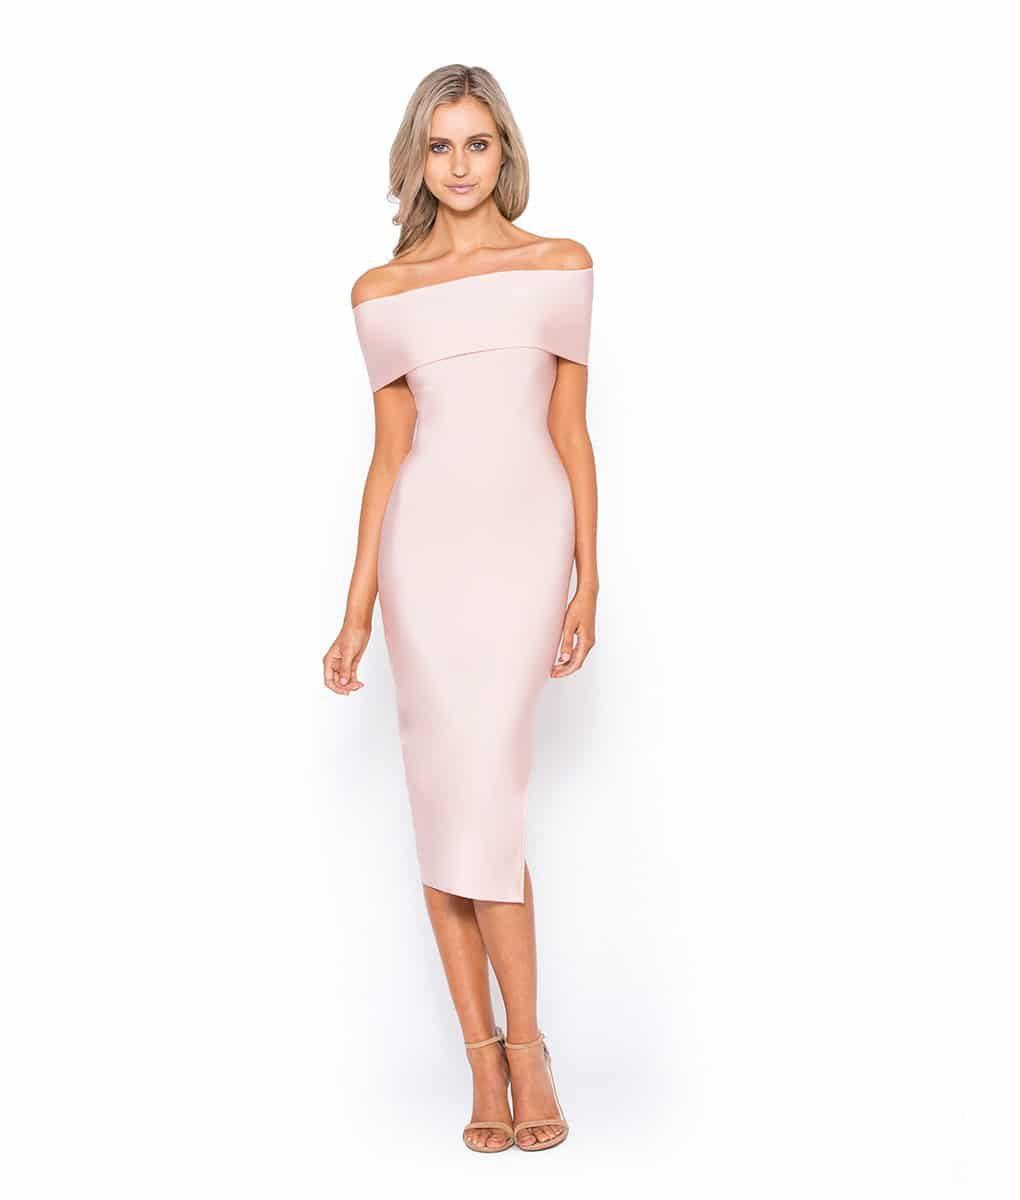 Alila Boutique Blush Bardot Bodycon Midi dress